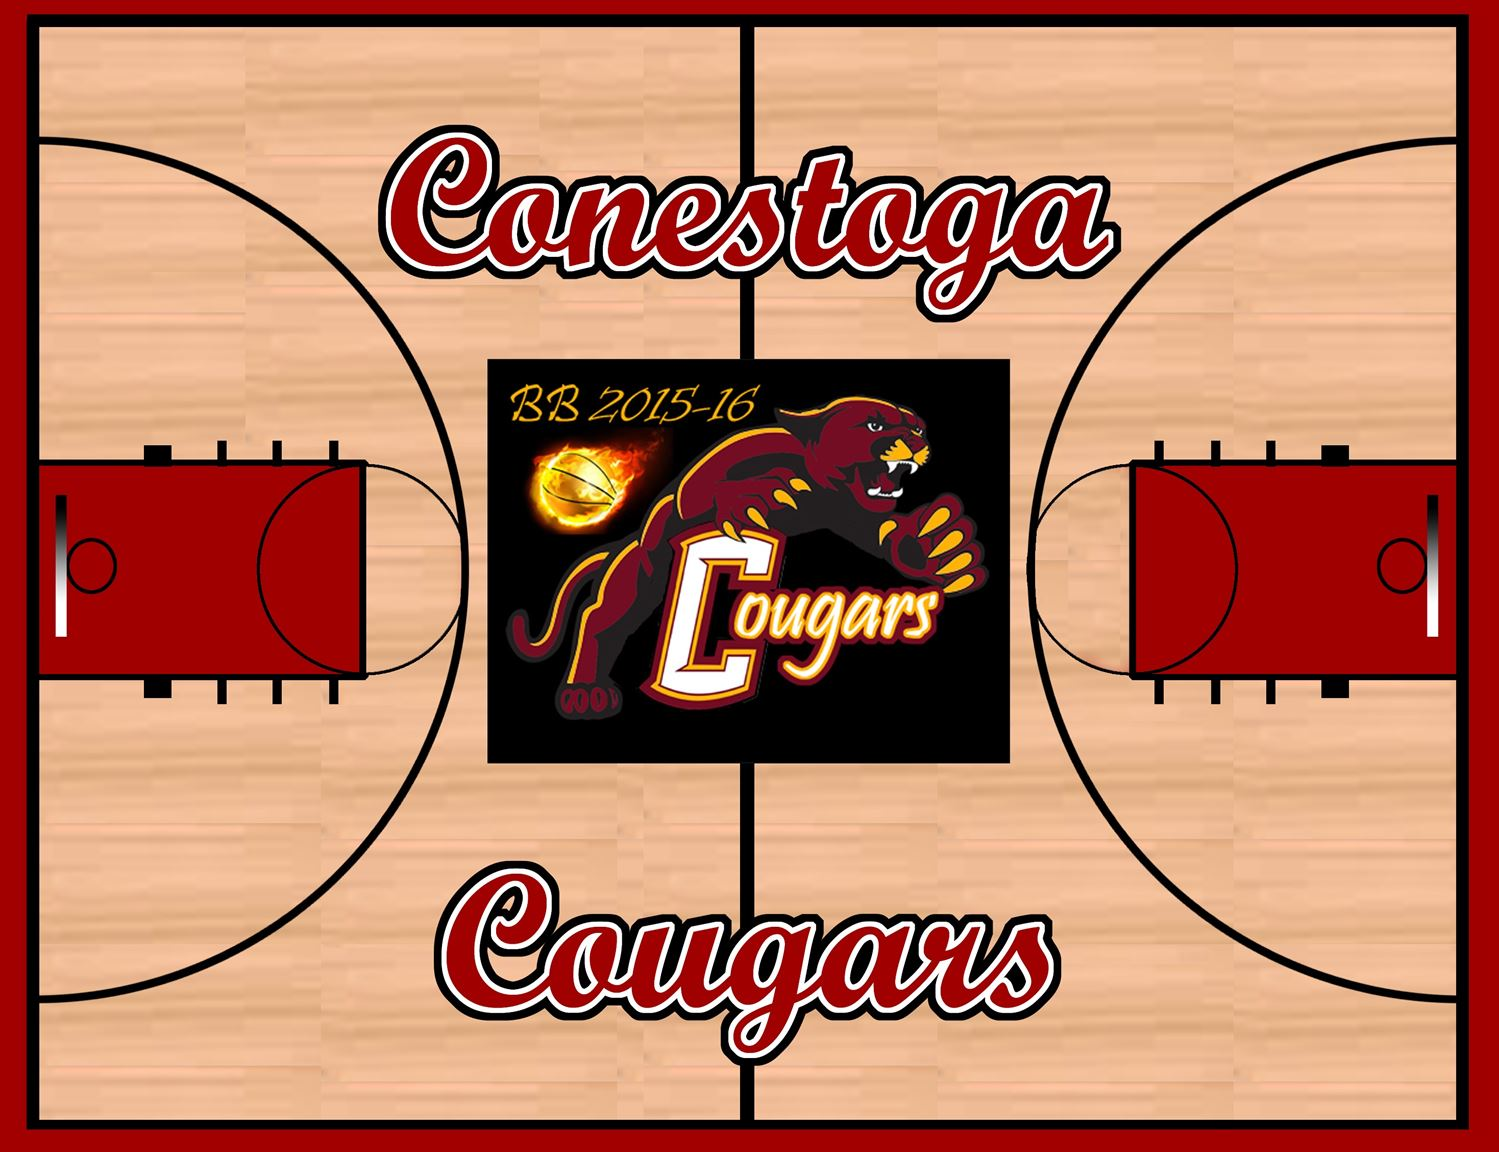 Conestoga High School - Conestoga Girls Varsity Basketball